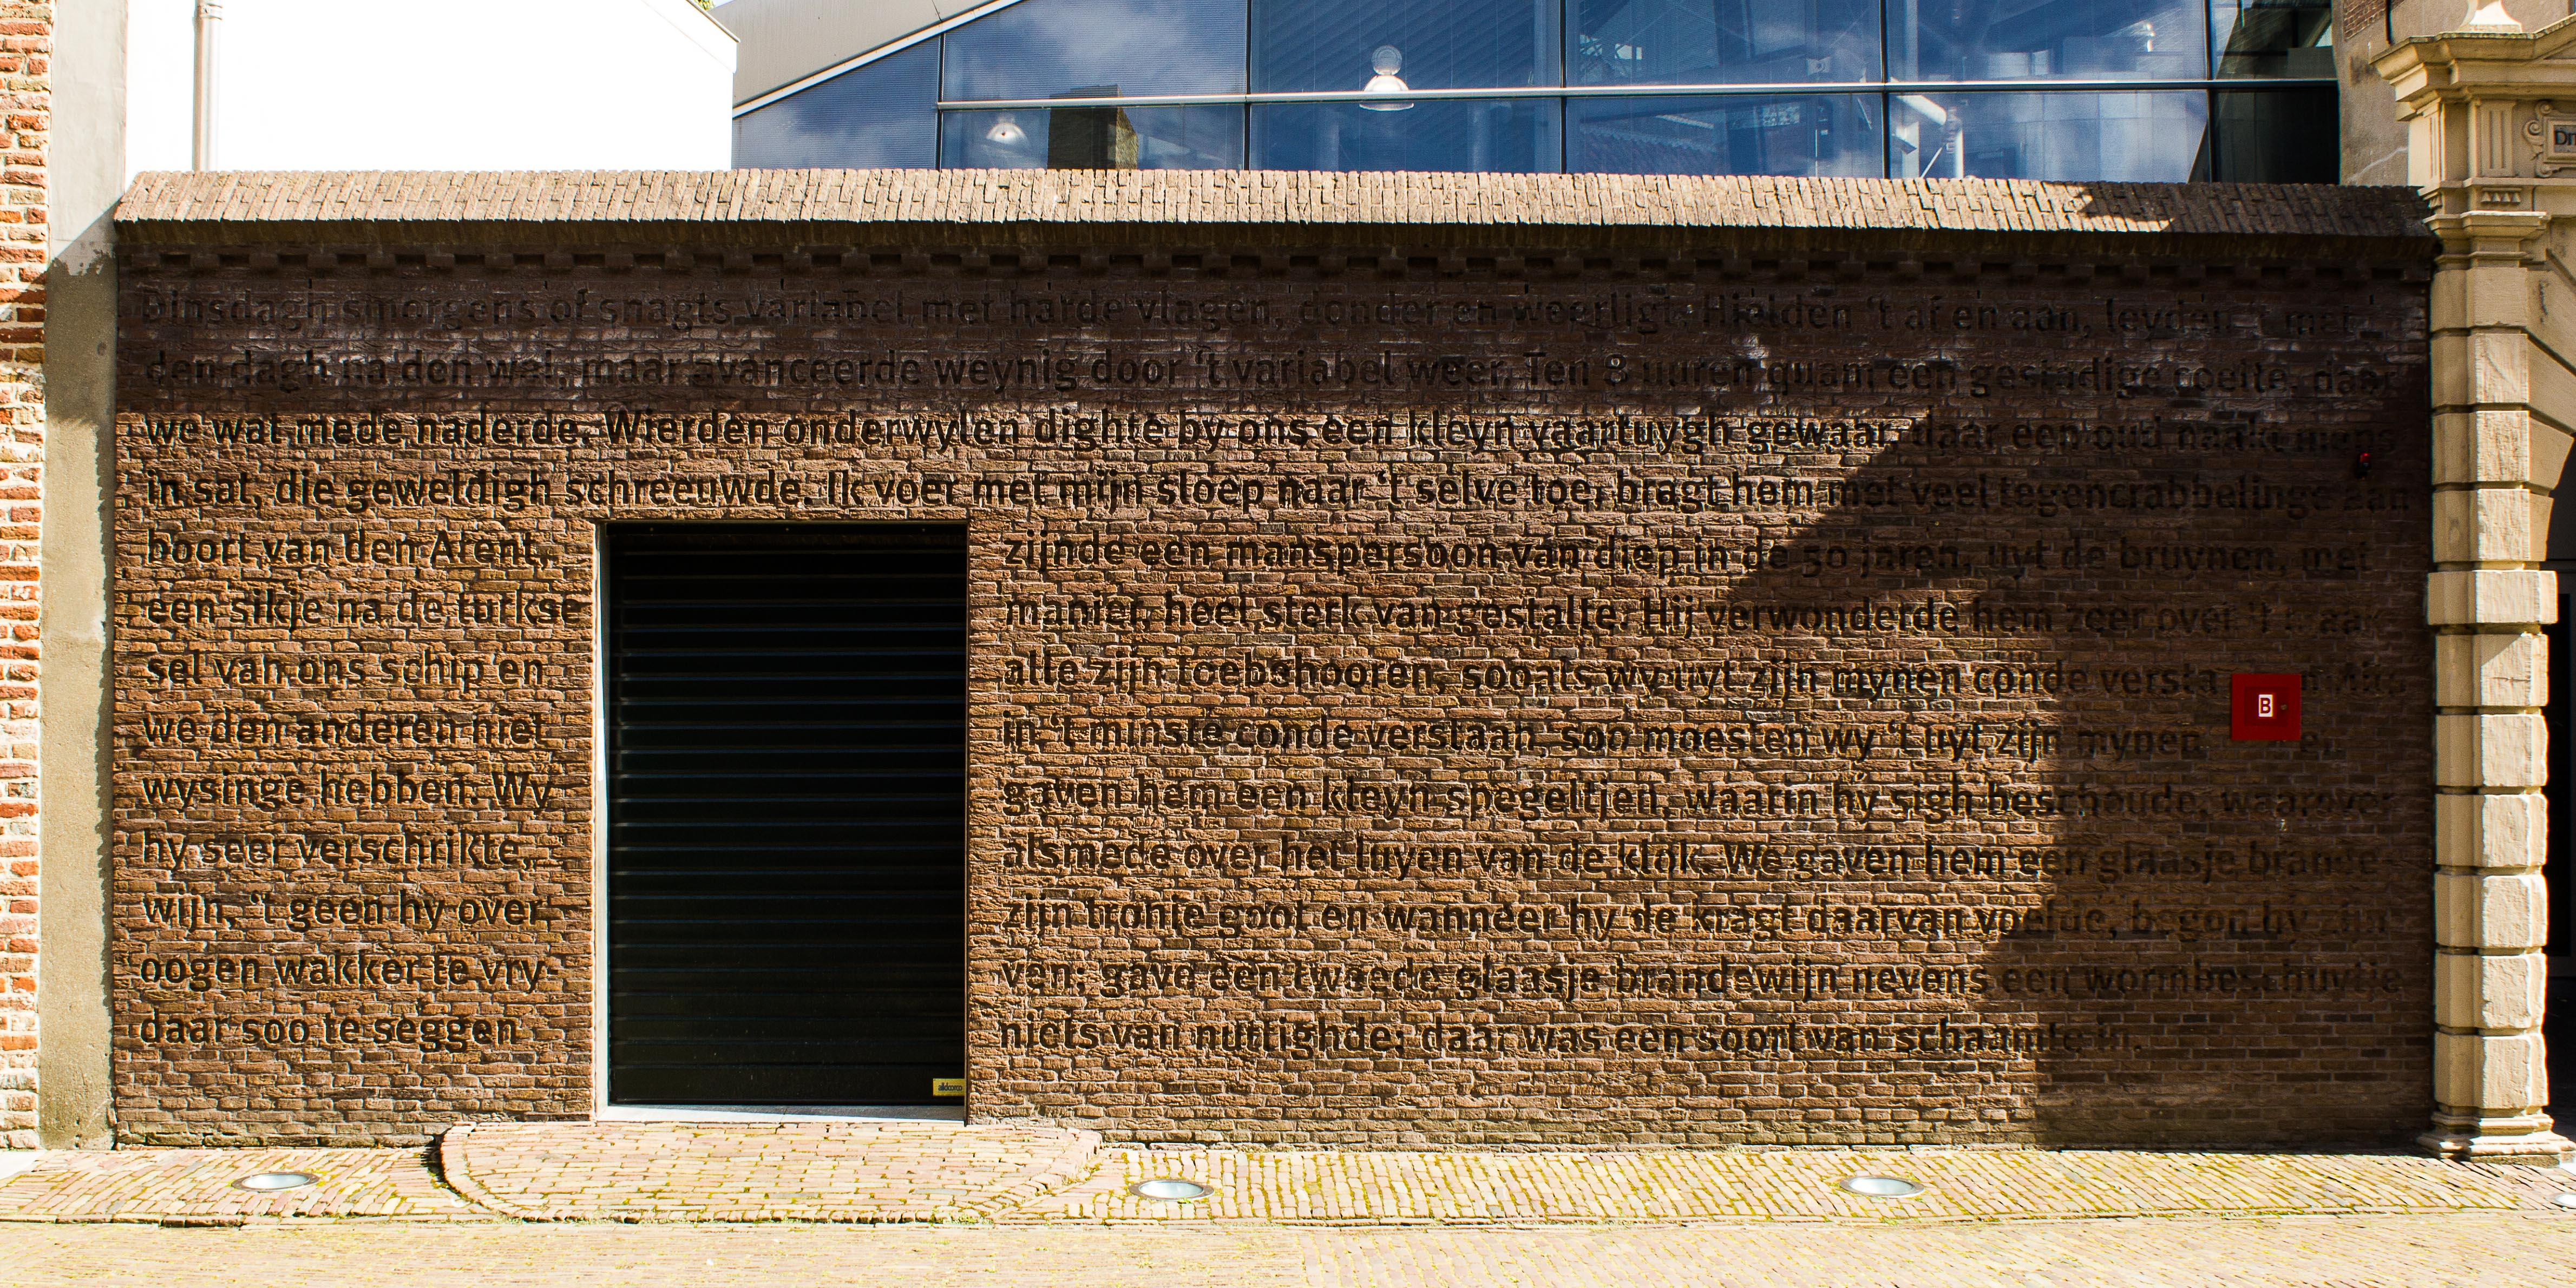 http://www.dorsoduro.nl/wp-content/uploads/2017/10/Muur-Zeeuws-archief-0377.jpg